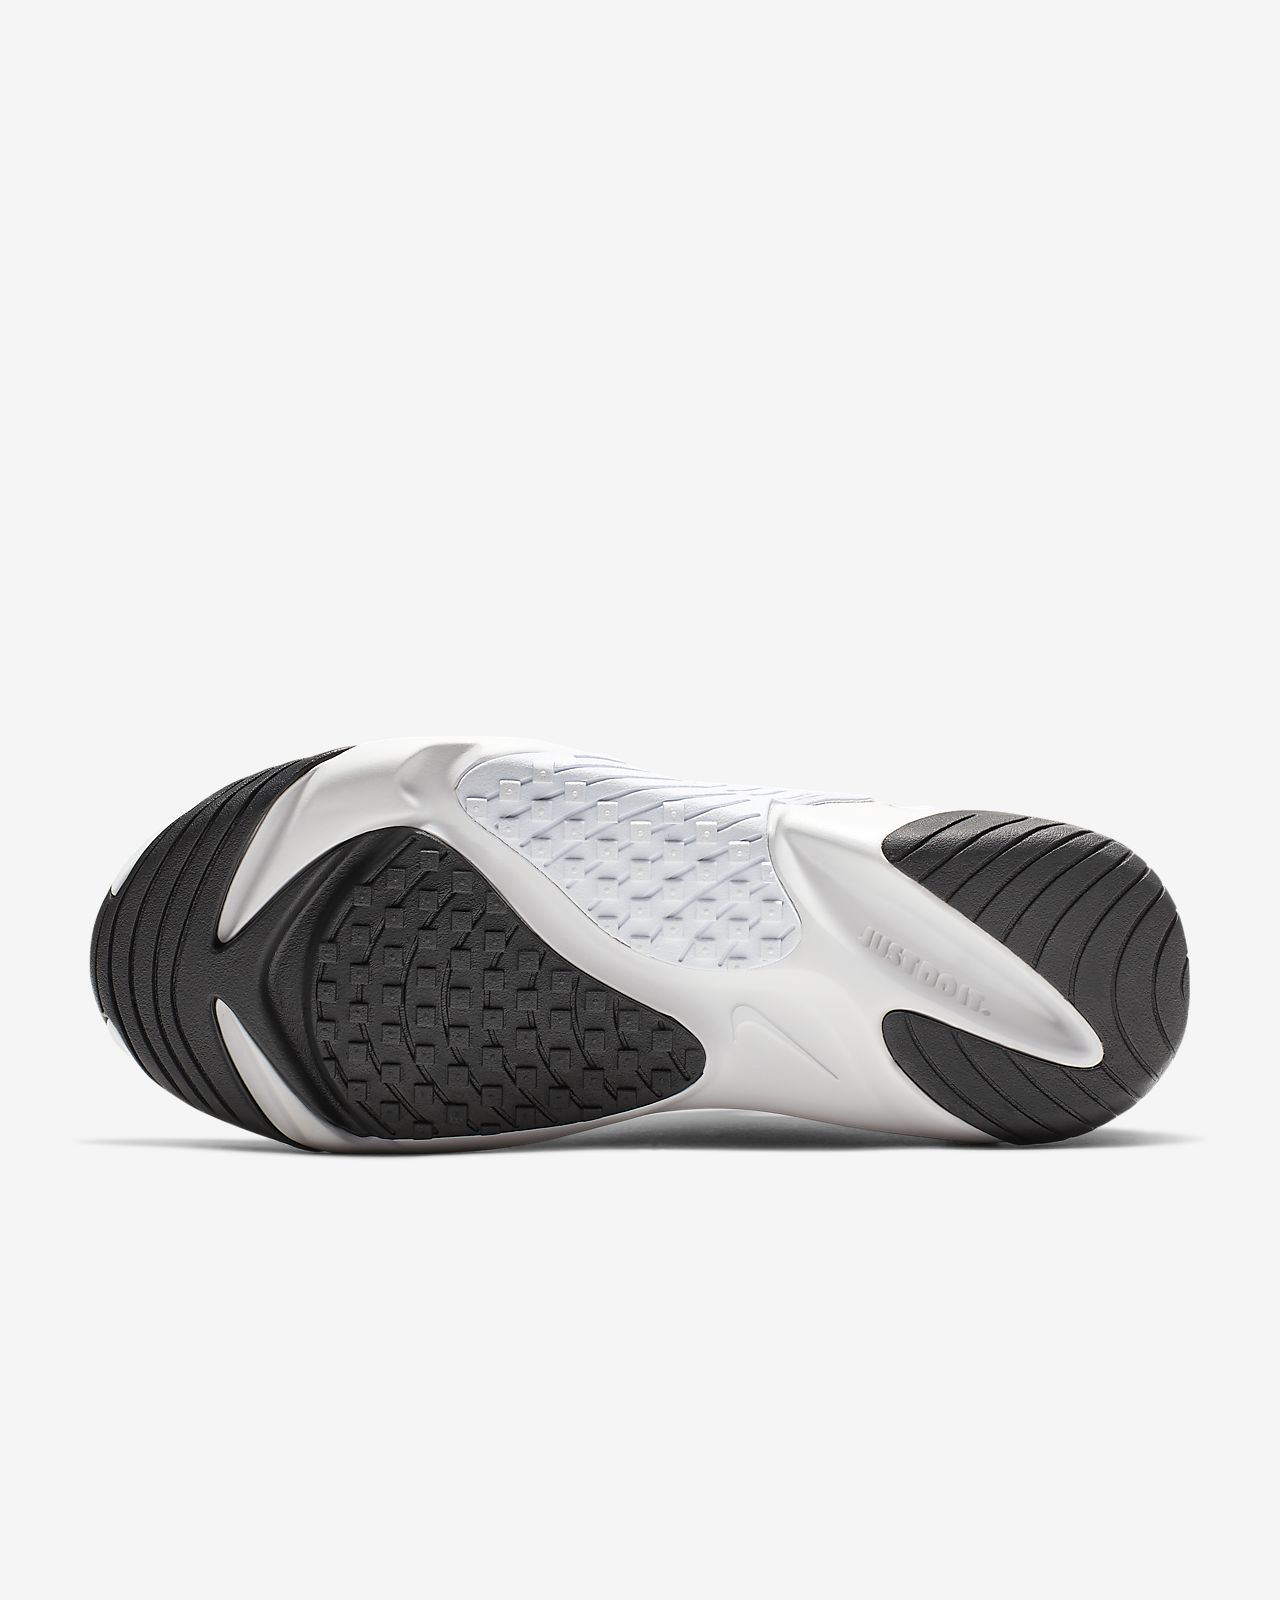 sneakers for cheap eeff4 65207 ... Sko Nike Zoom 2K för kvinnor